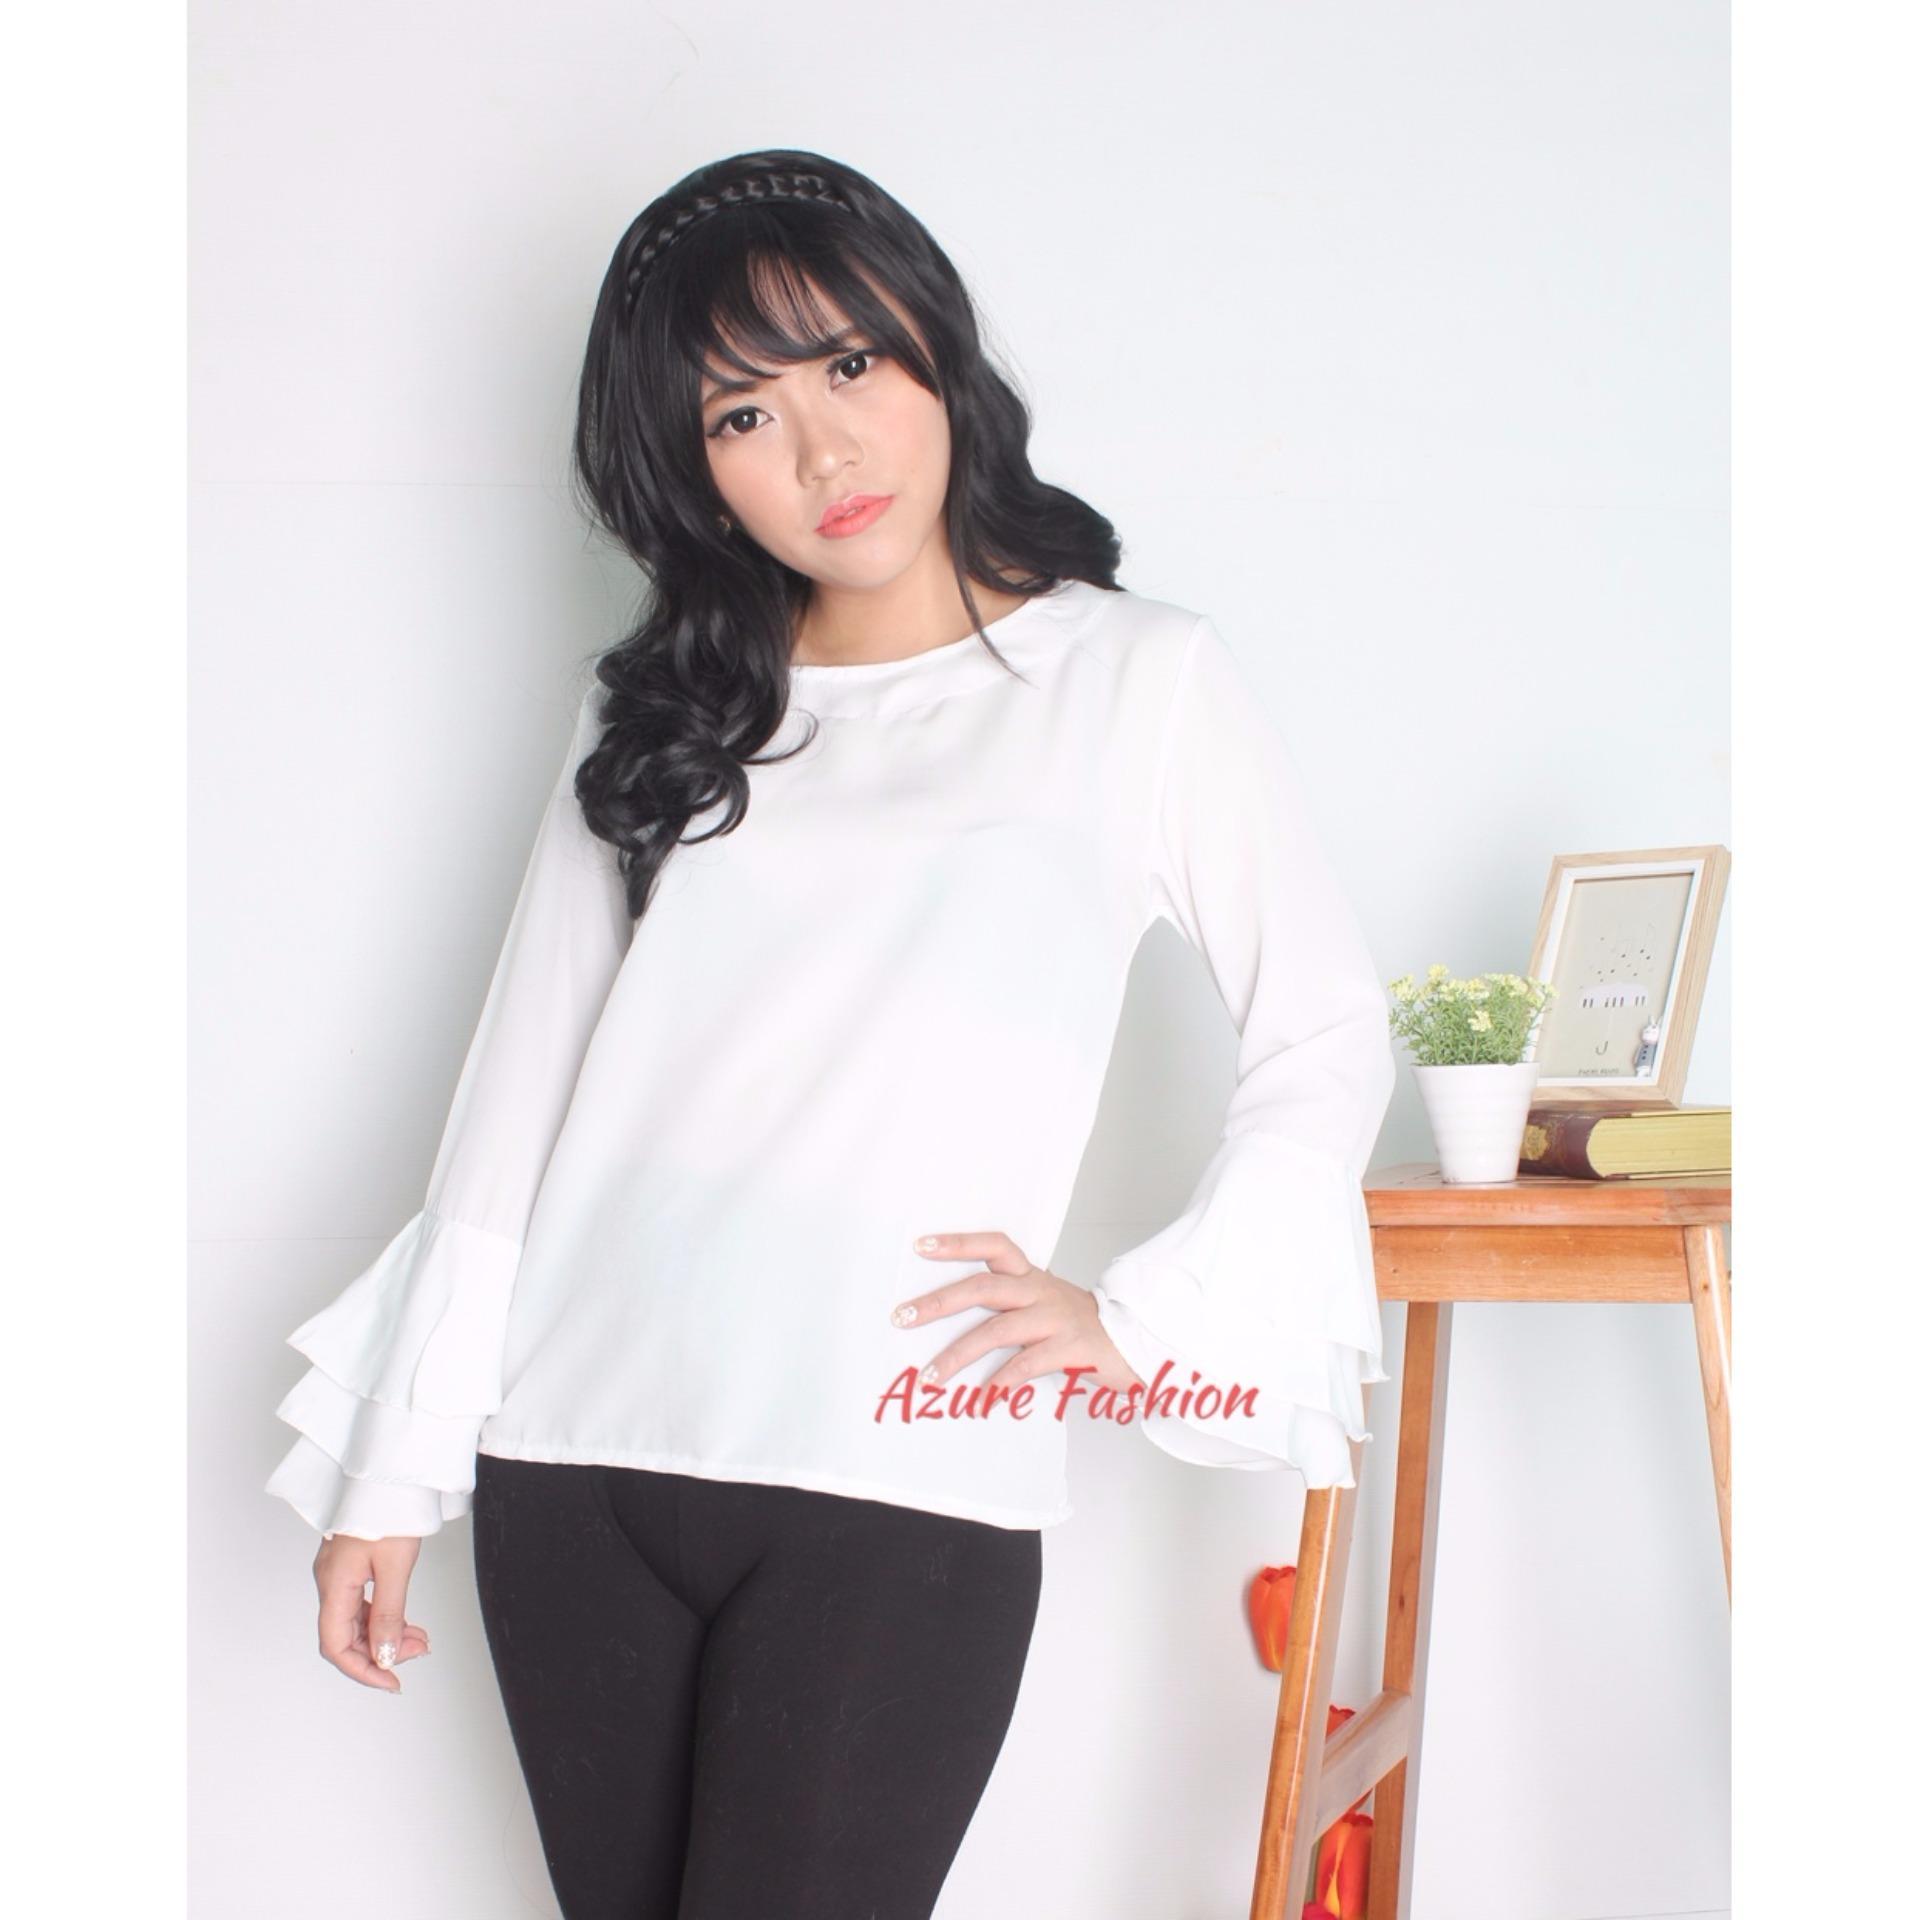 Reyn Shop Tunic Kidi Dress Hitam Baju Wanita Dress Wanita Dress Source · Tifani Top Putih